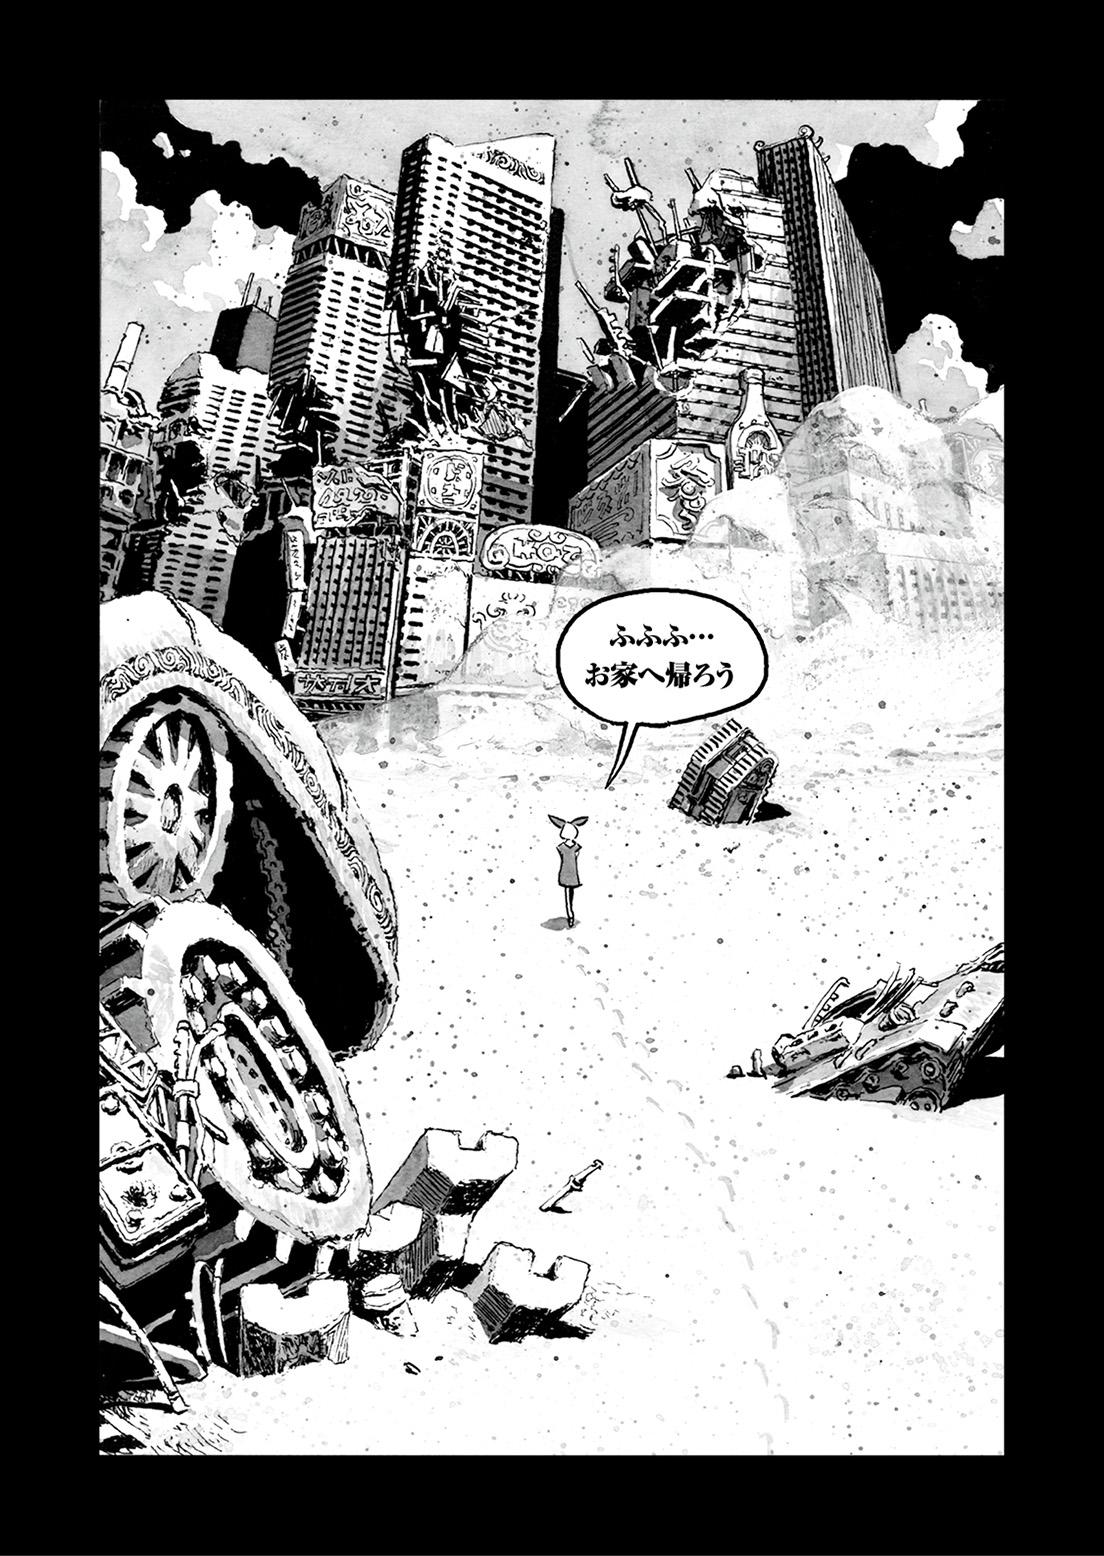 長編漫画「BIBLIOMANIA」連載 第4話「285号室の食卓」12P